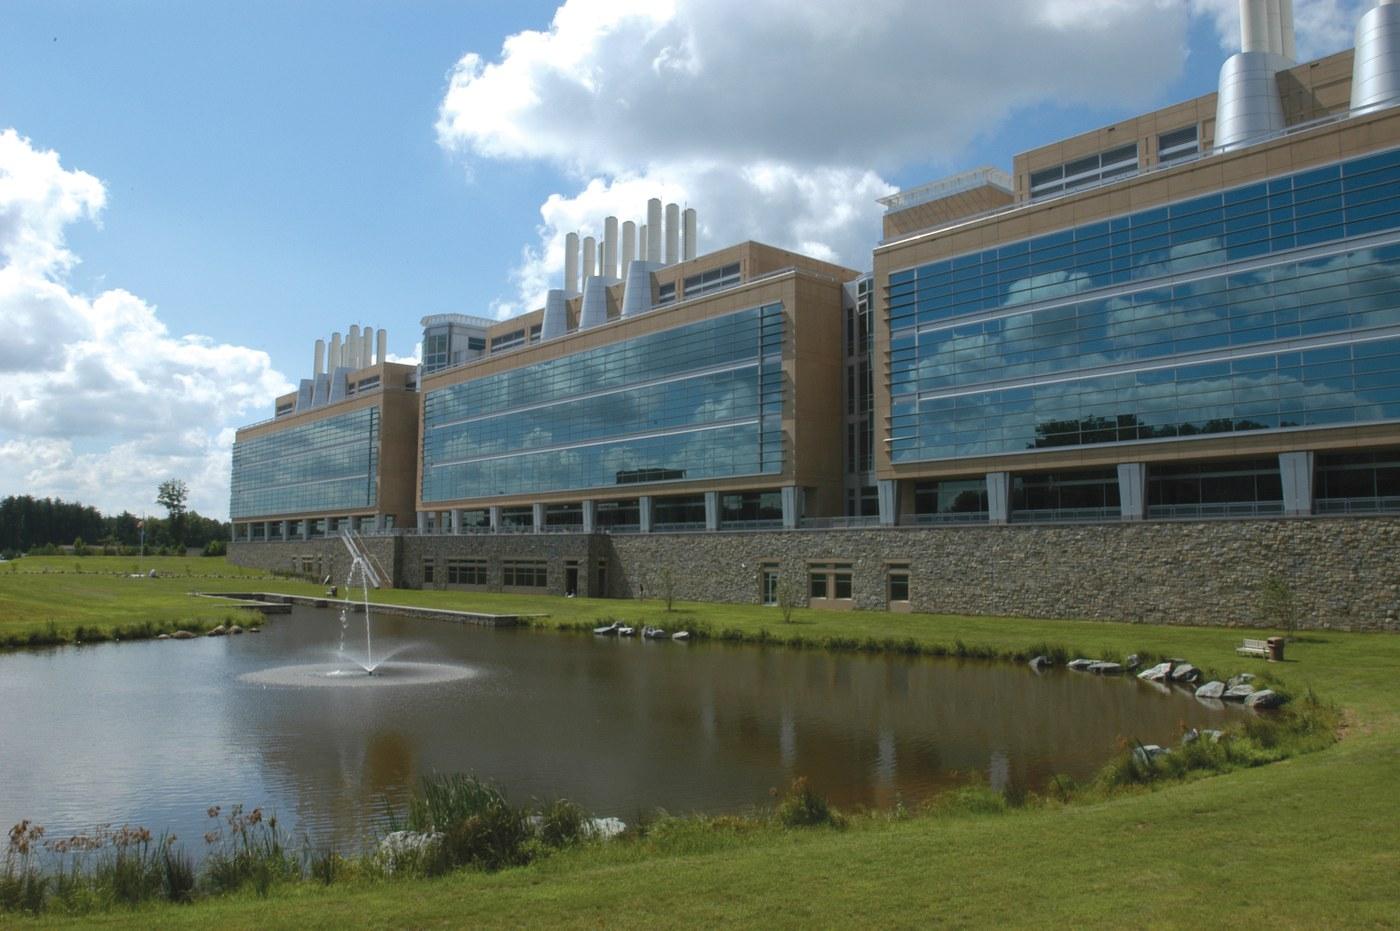 Buildings clipart laboratory building. Services fbi at quantico